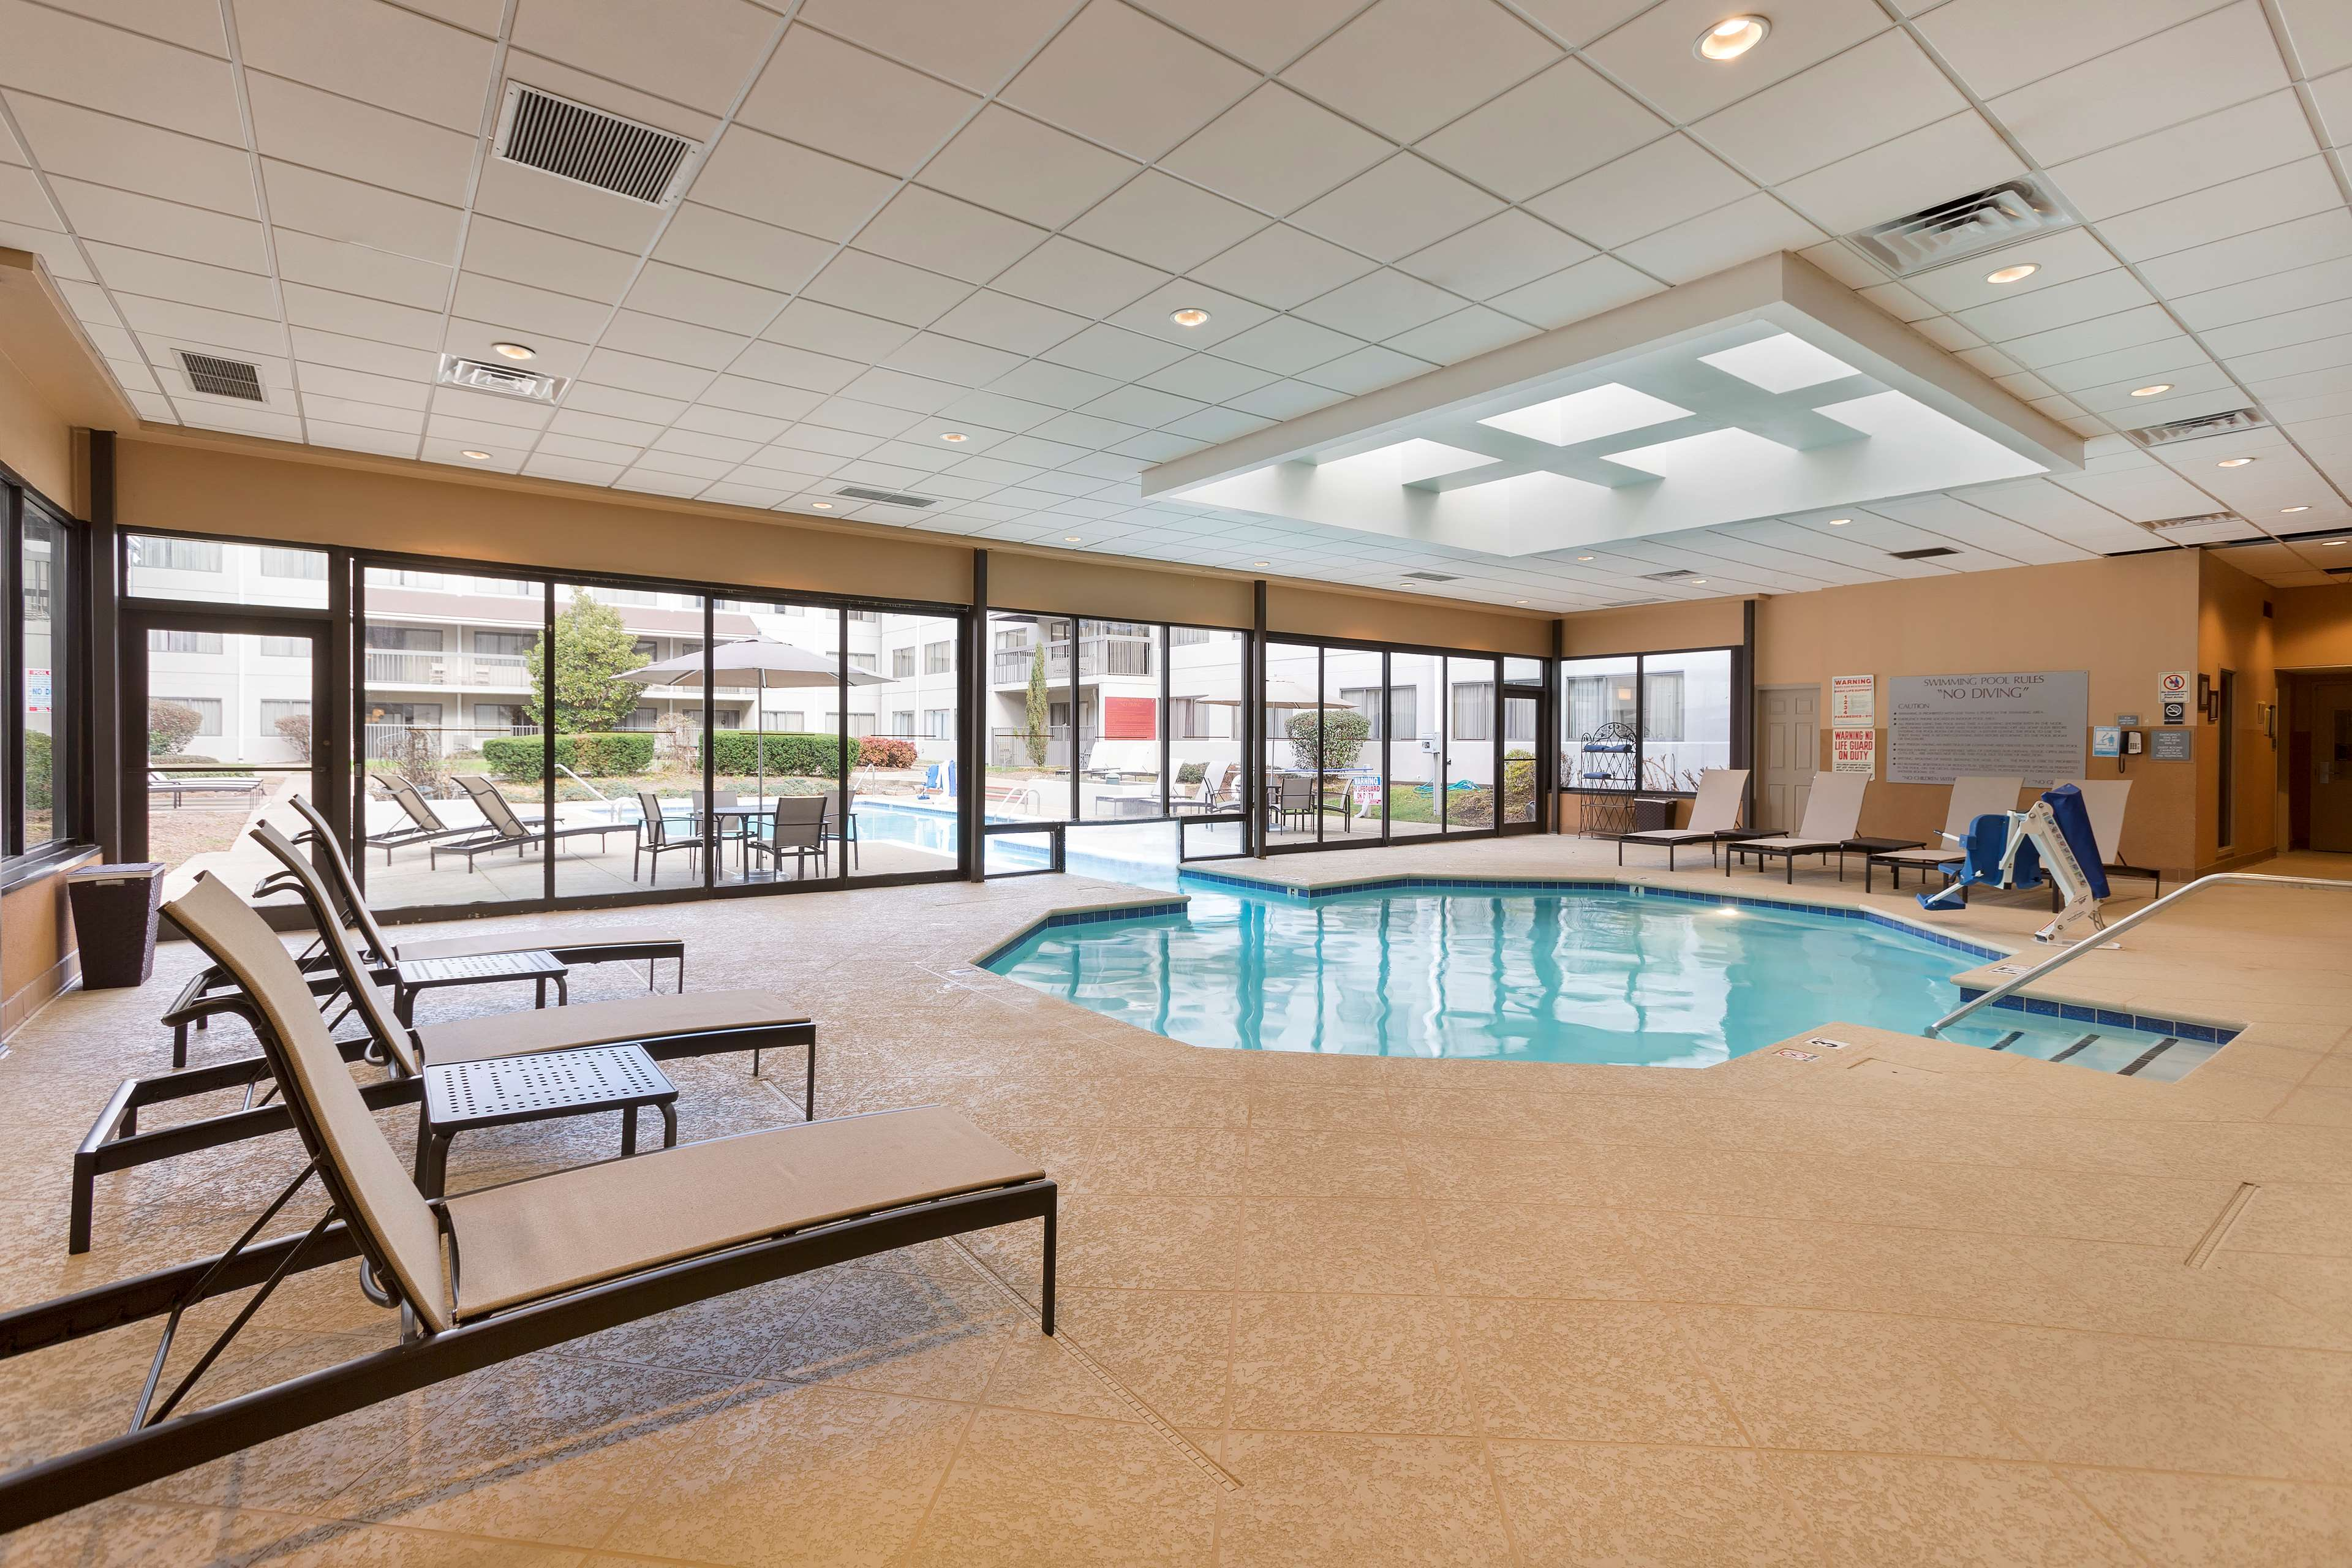 DoubleTree Suites by Hilton Hotel Nashville Airport image 9